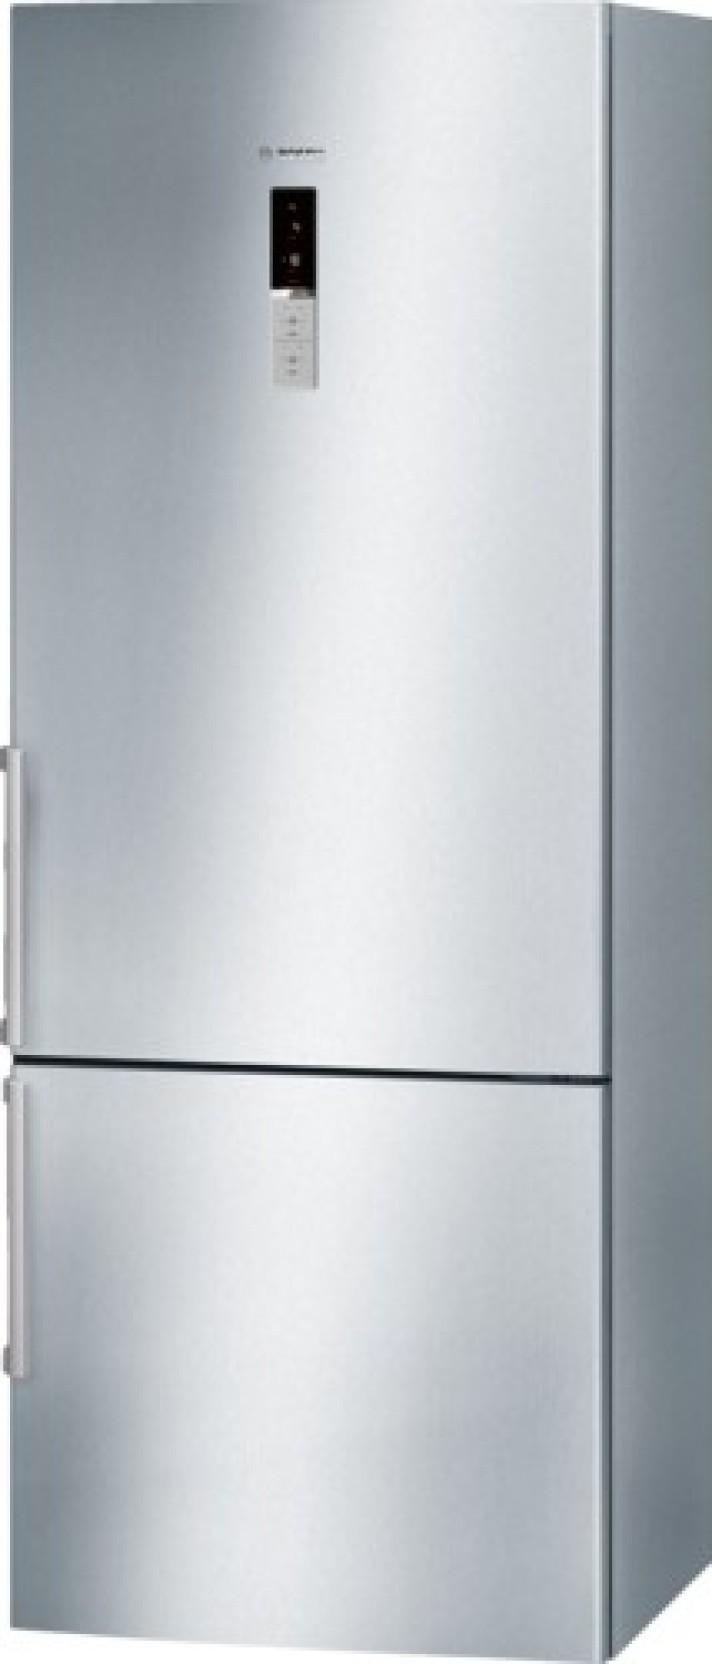 Bosch 505 L Frost Free Double Door 2 Star Refrigerator Online At Alarm Circuit For Doors Add To Cart